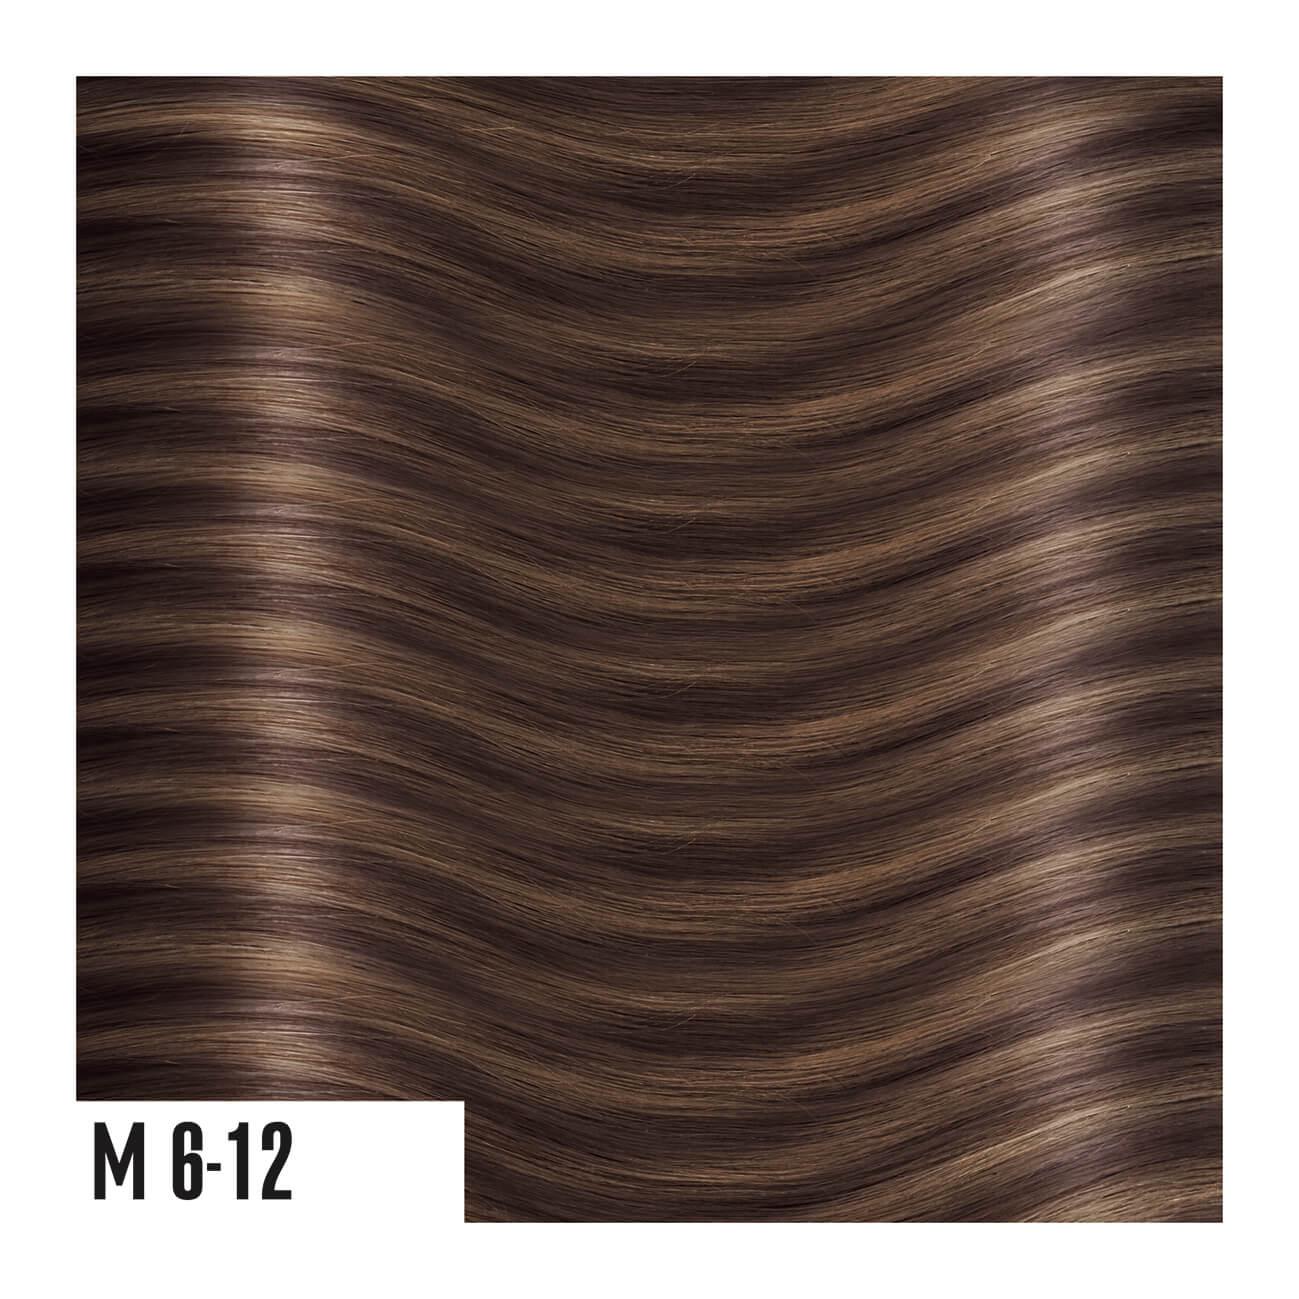 M6-12